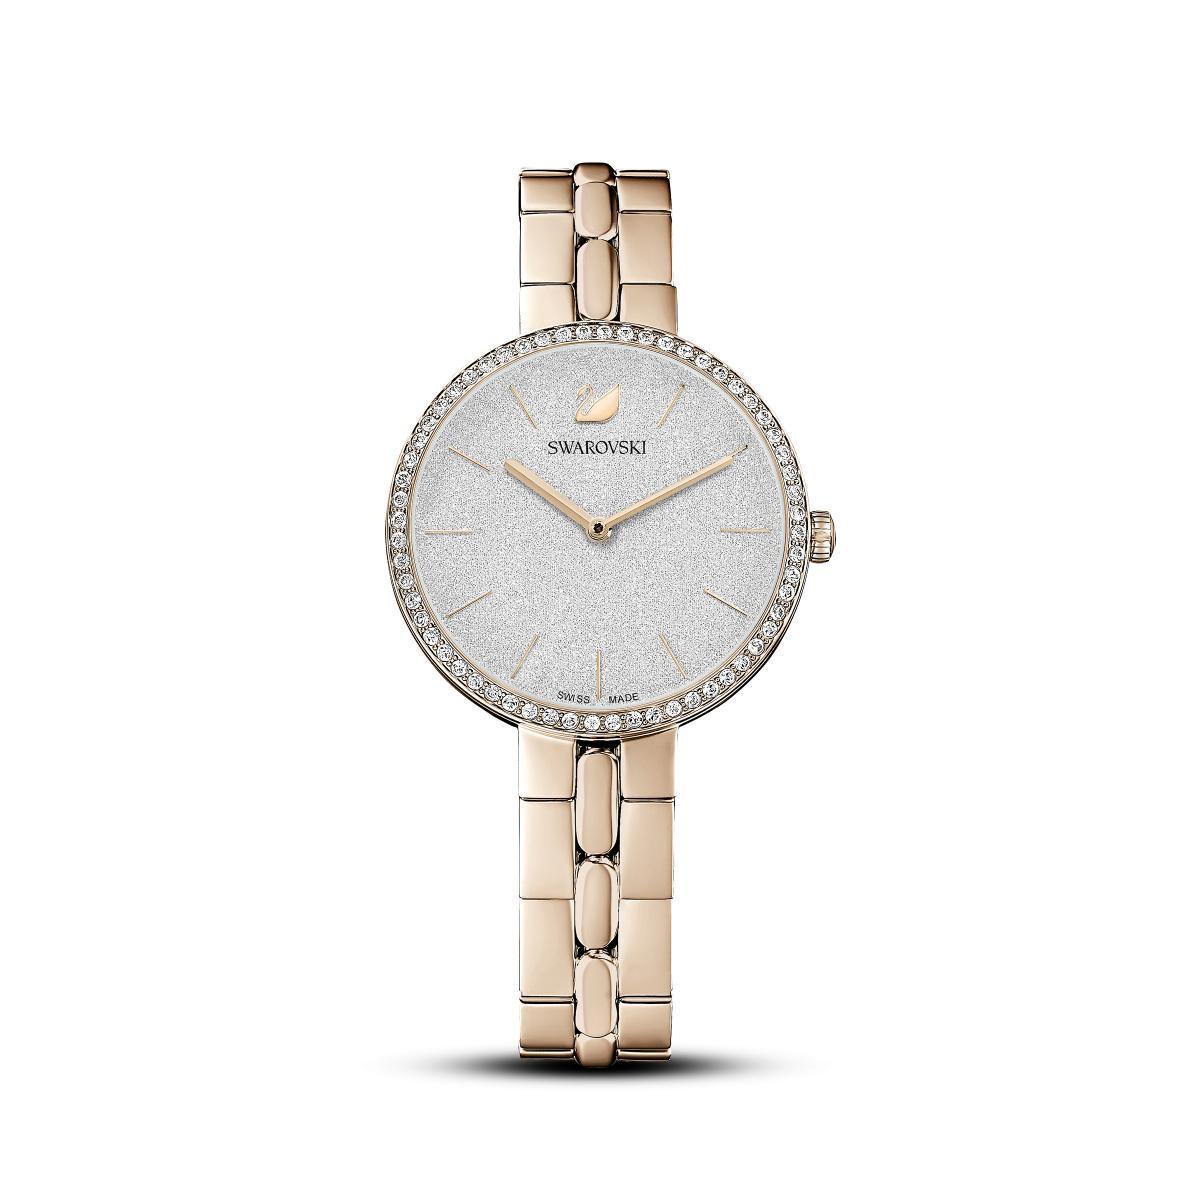 MONTRES 5517794 - COSMOPOLITAN - Swarovski montres - Modalova